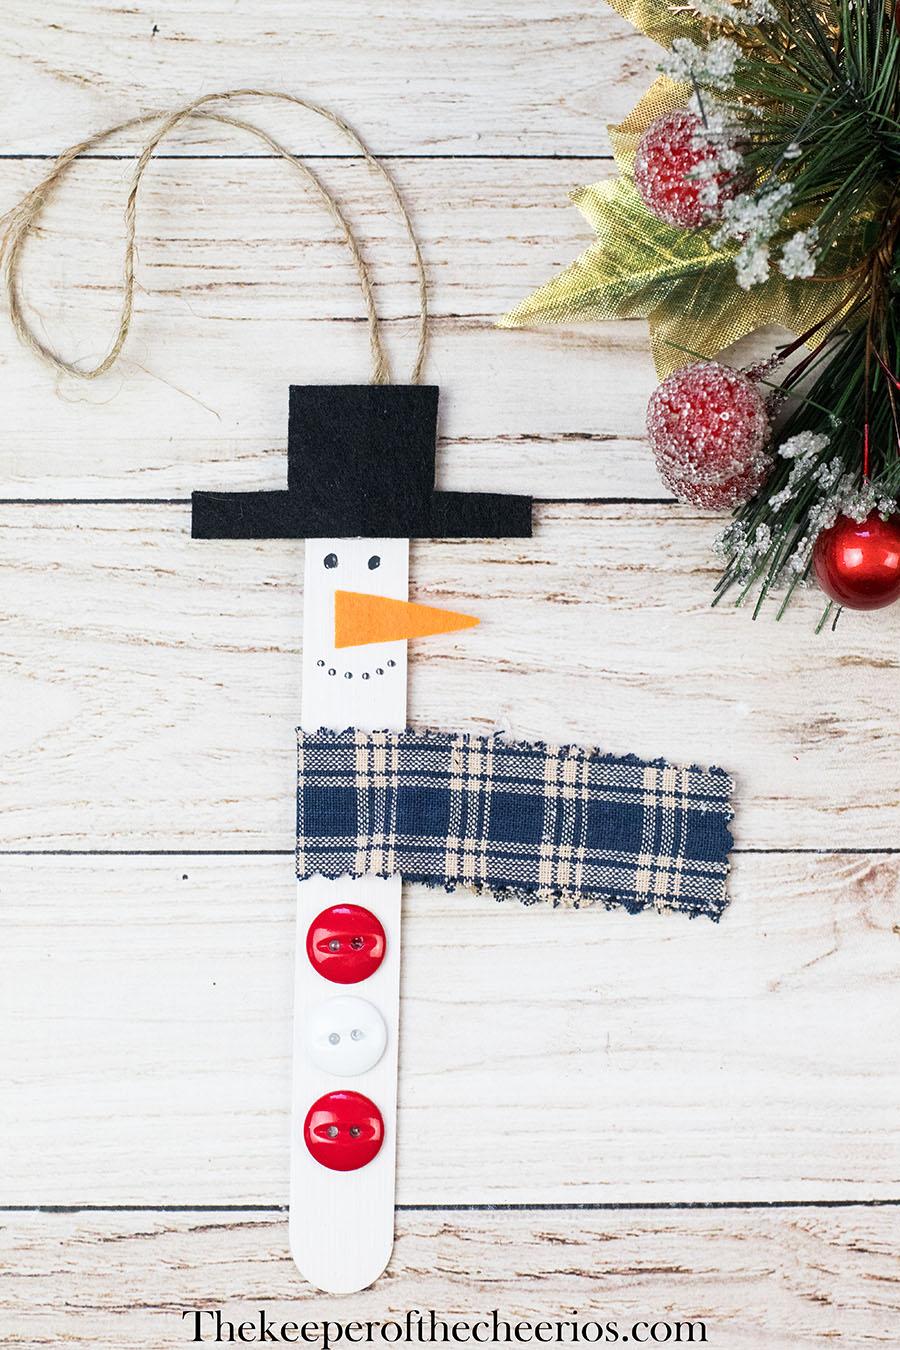 Craft-Stick-Snowman-Ornament-7